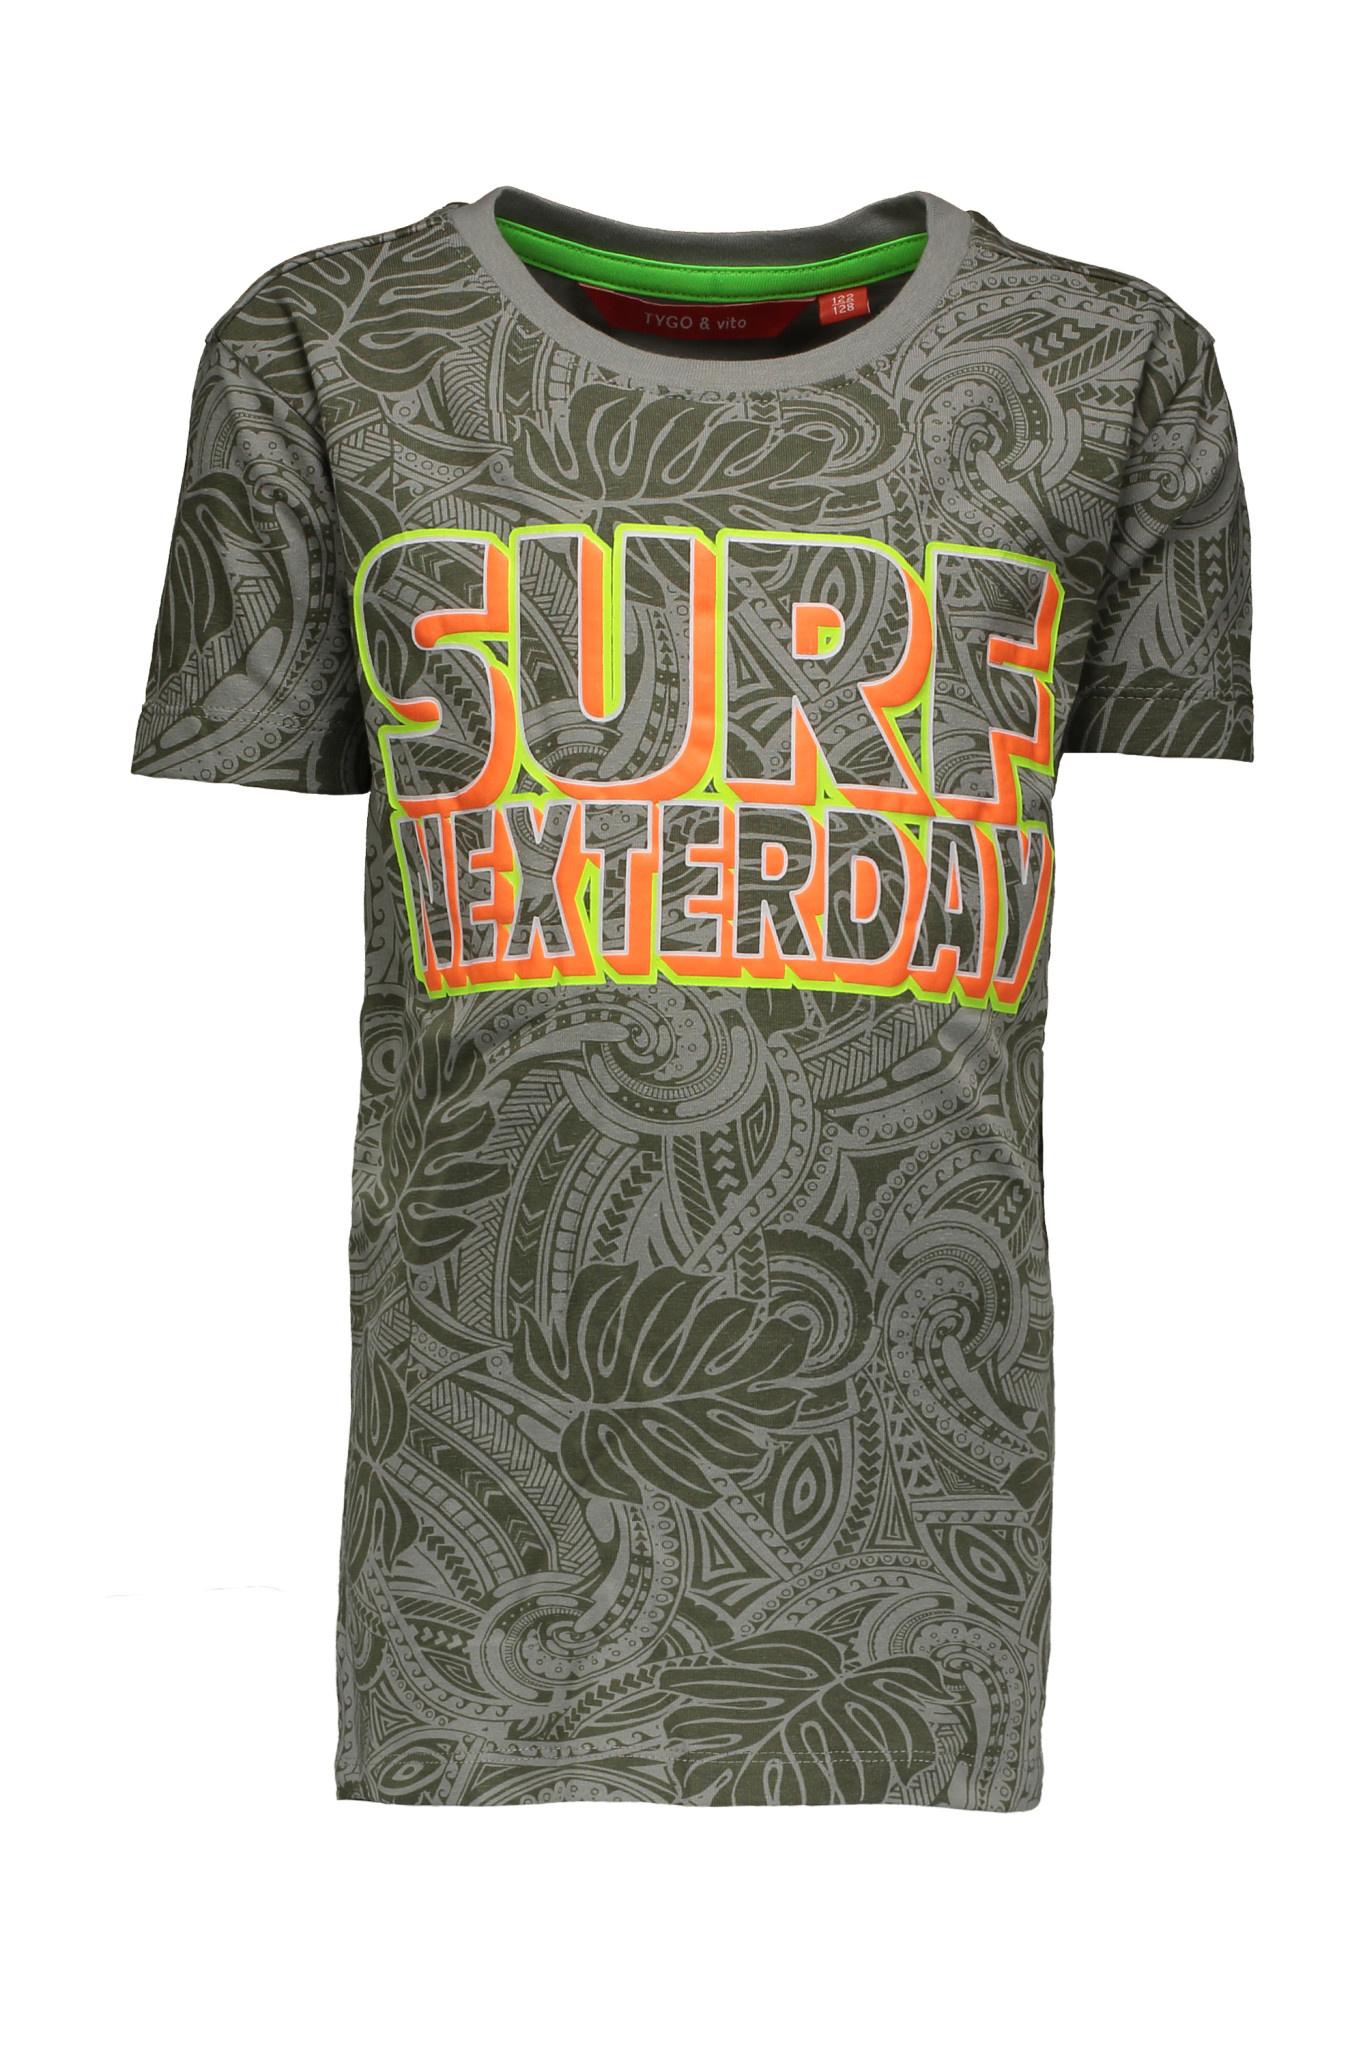 TYGO&vito TYGO&vito T-shirt aop surf nexterday army